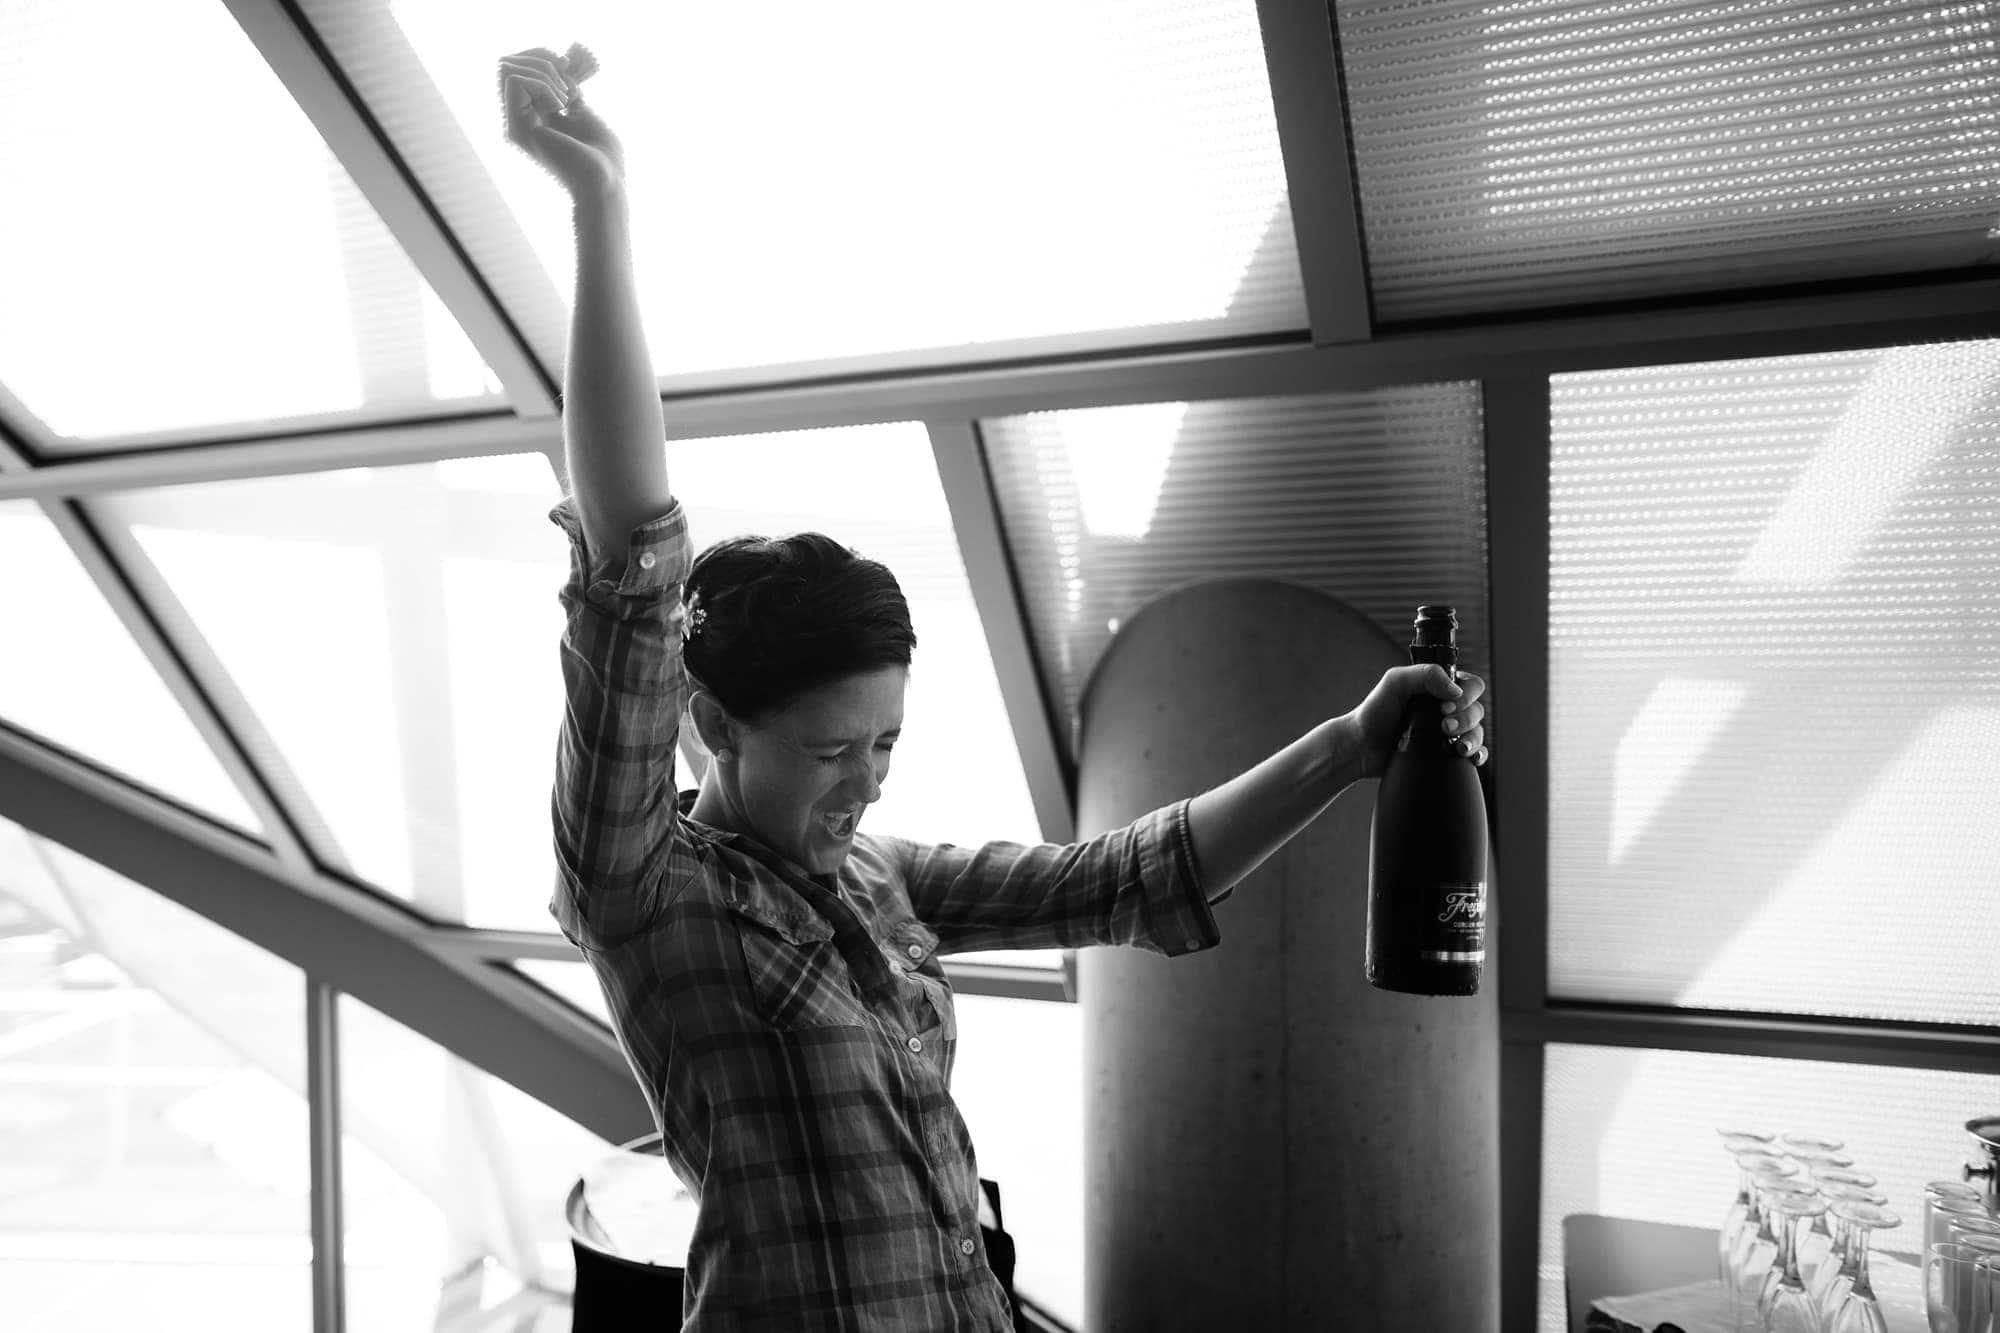 Amanda cracks open a bottle of champagne